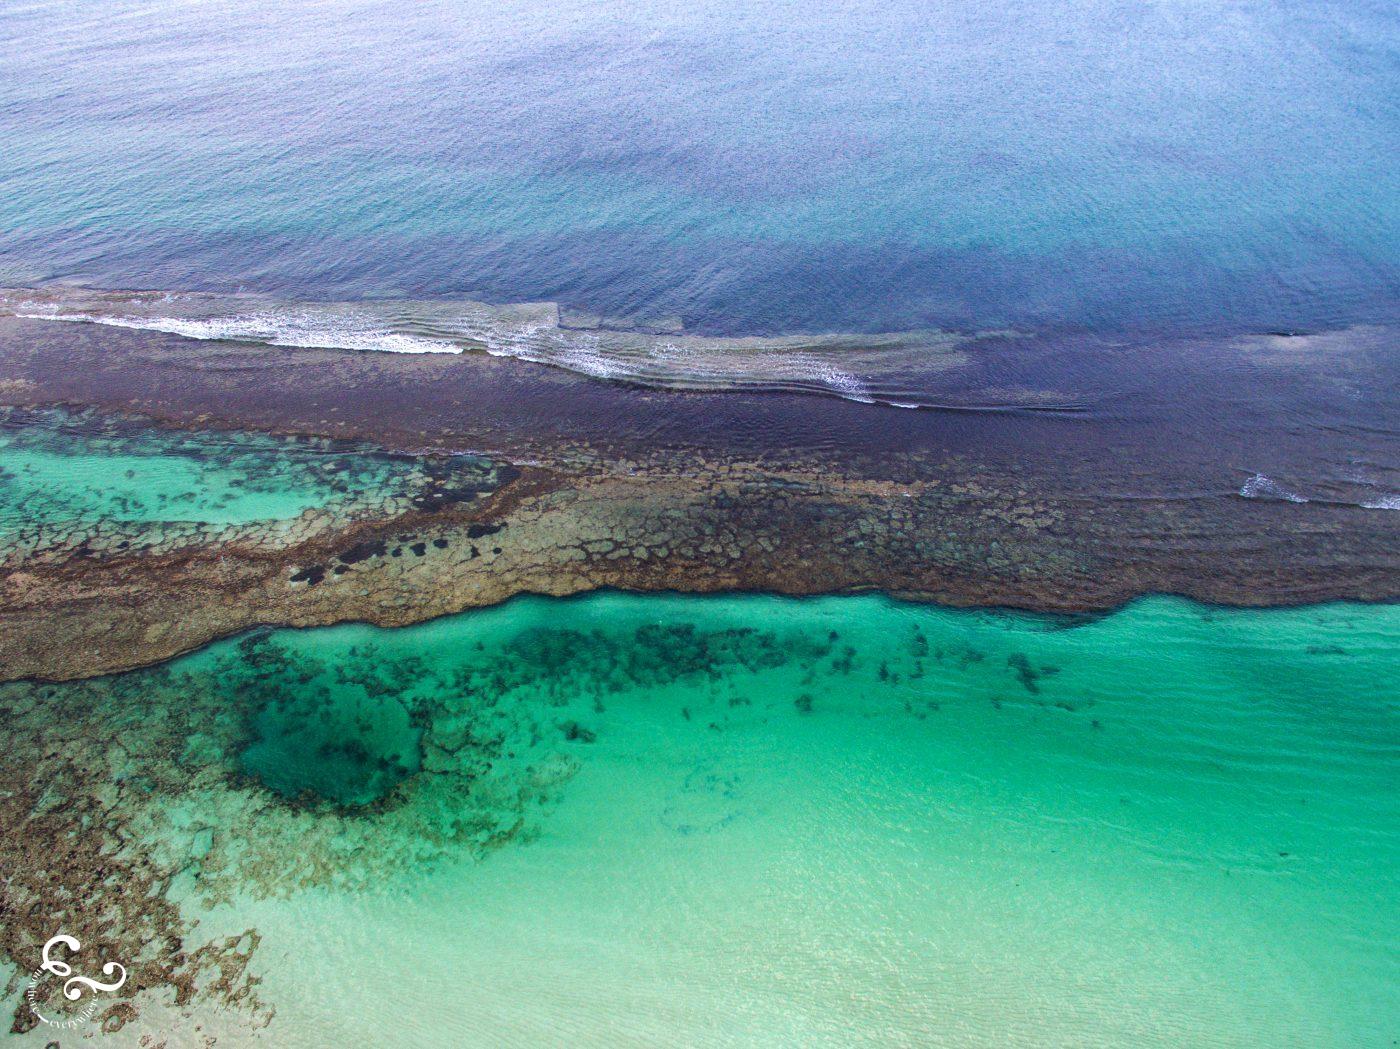 Yanchep Beach Perth Western Australia Oceans Lis Dingjan Nowhere & Everywhere Travel Blog Sustainability Environmentalism PerthisOk #perthisok Sunset